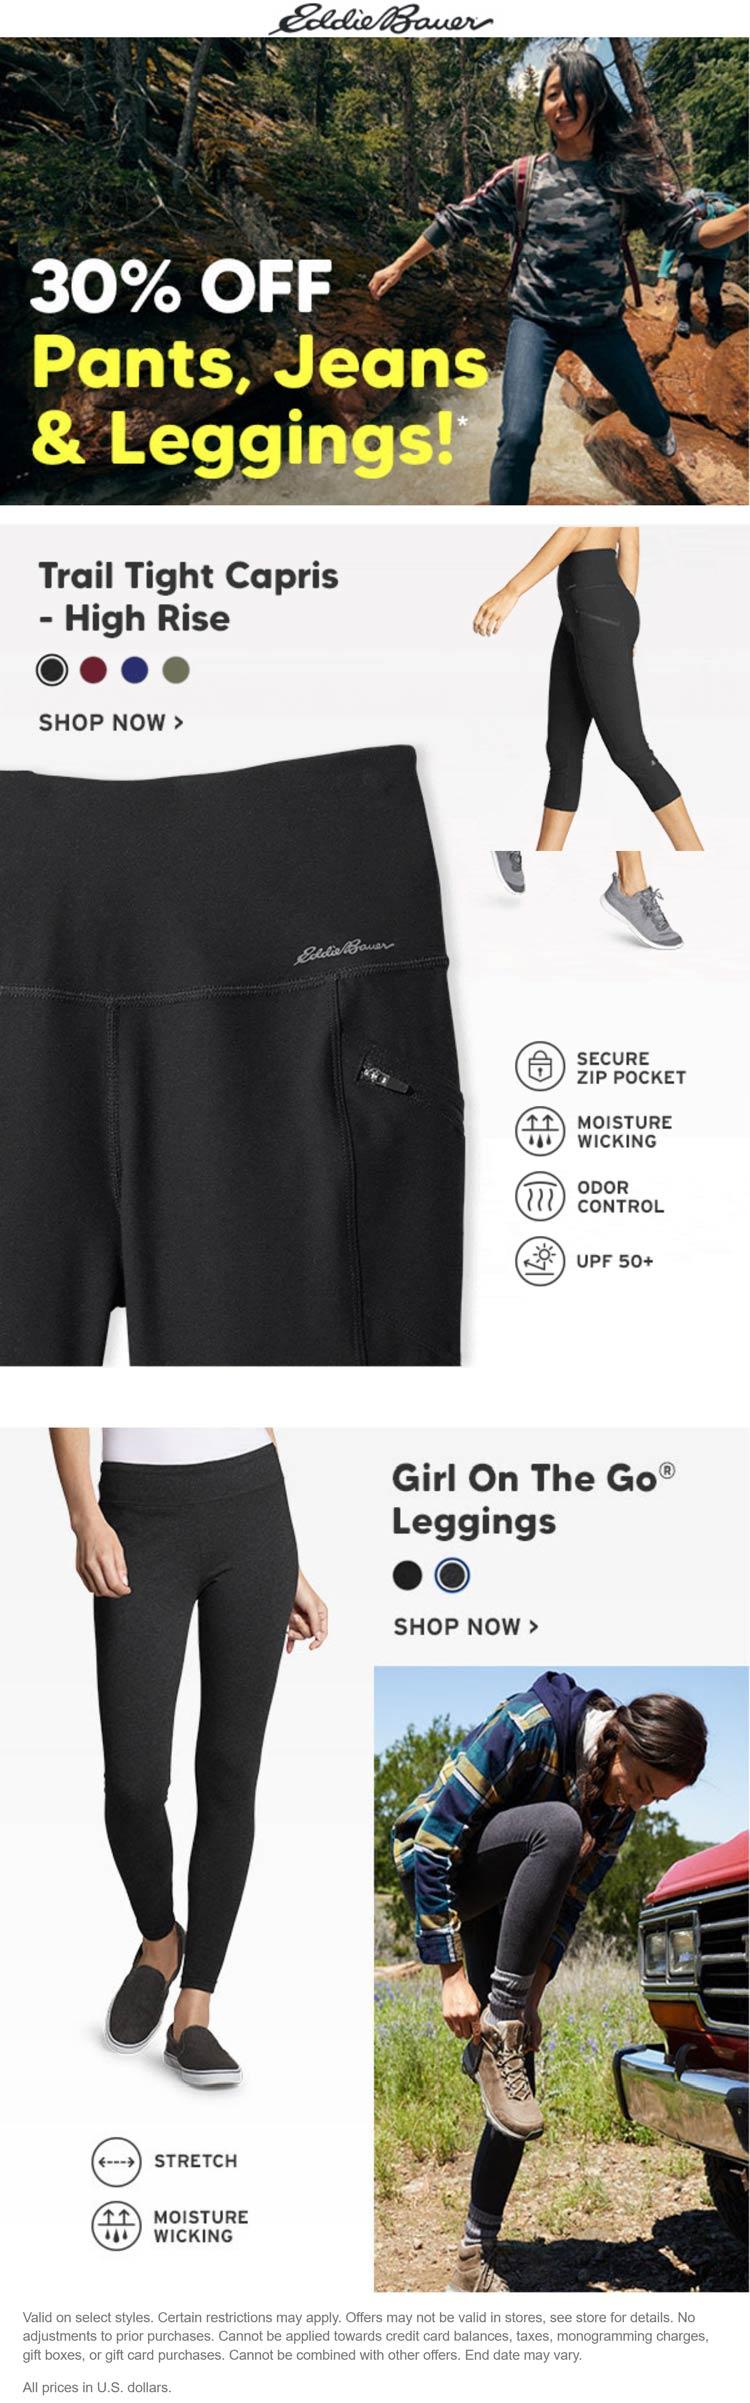 Eddie Bauer stores Coupon  30% off pants, jeans & leggings at Eddie Bauer #eddiebauer